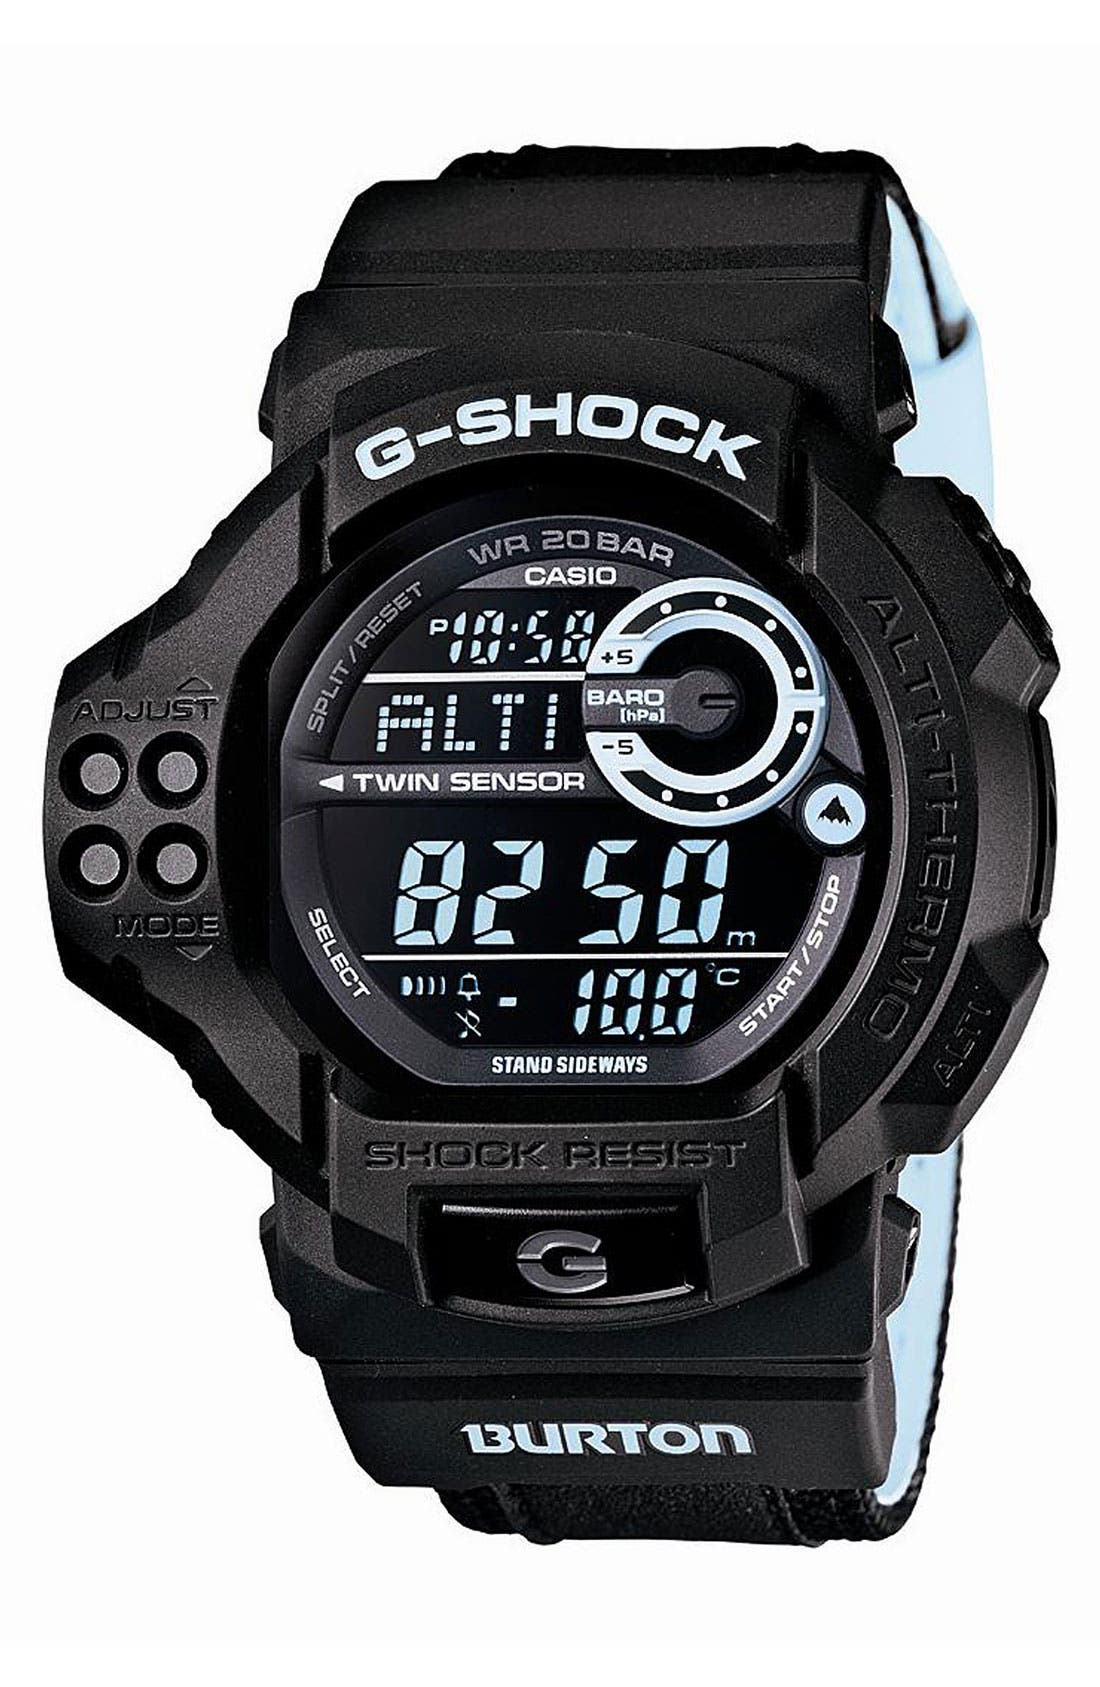 Main Image - G-Shock 'Burton' Digital Watch